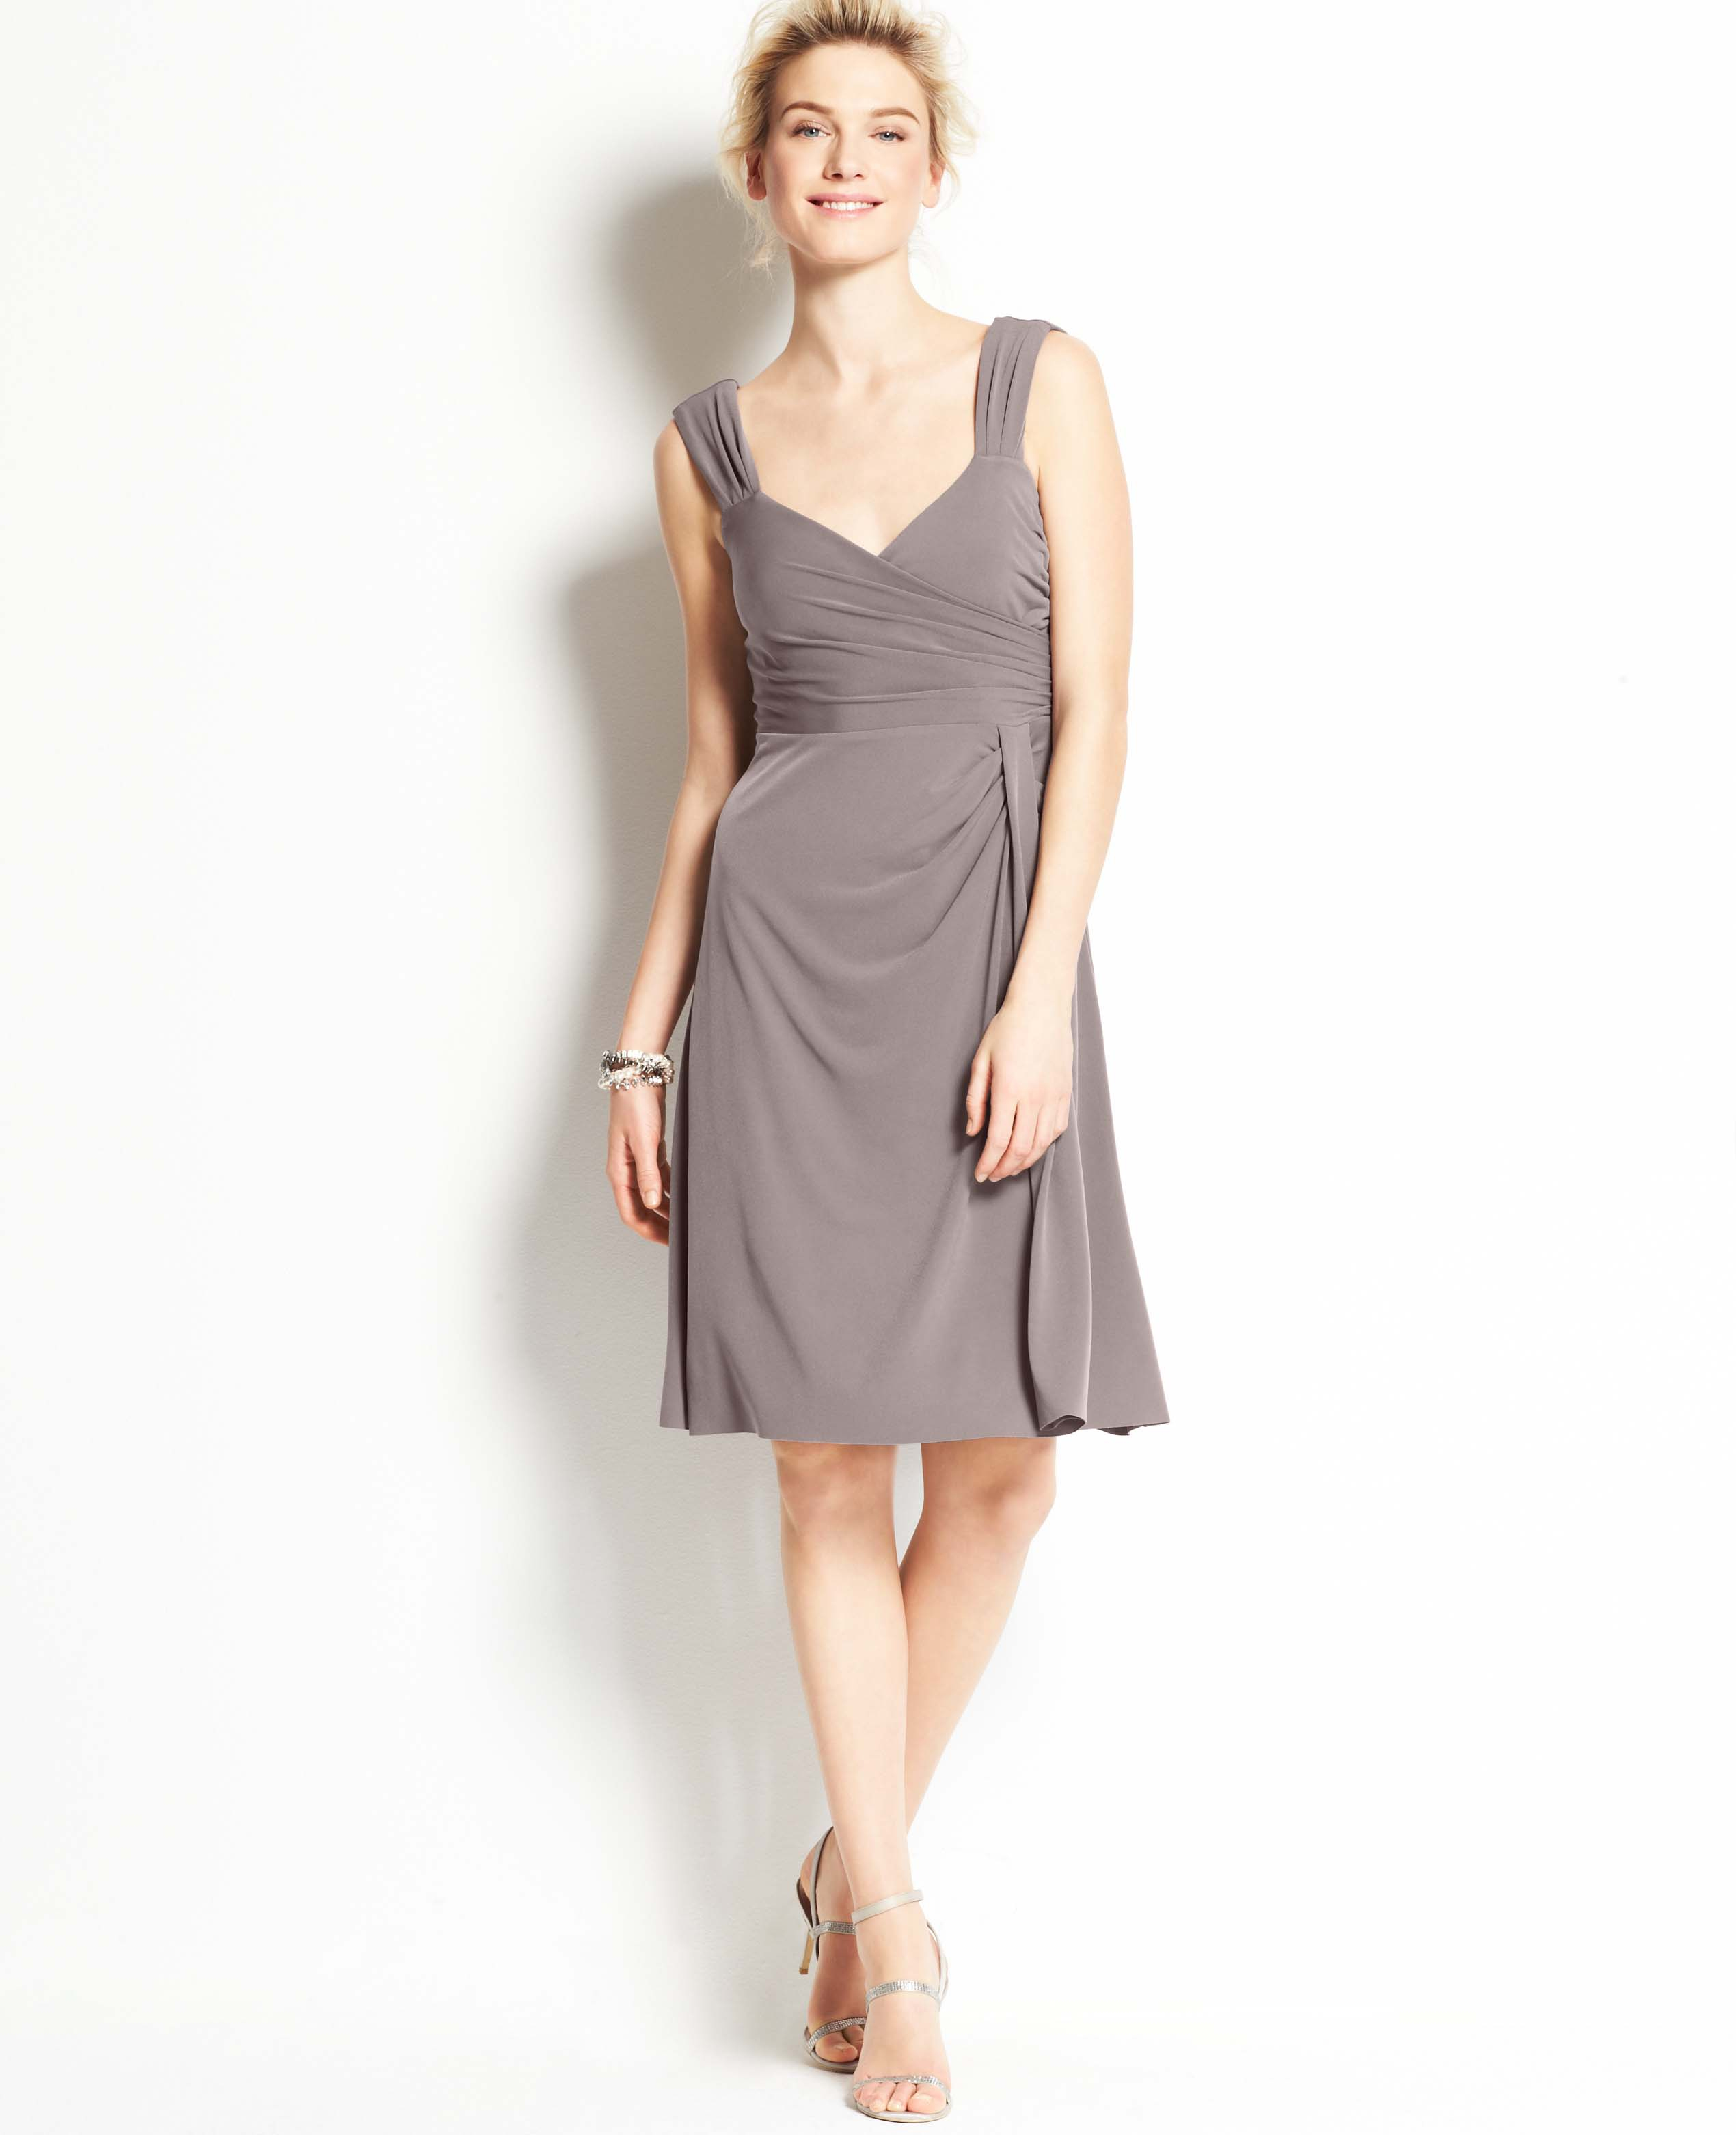 ann taylor plus size dresses - best gowns and dresses ideas & reviews